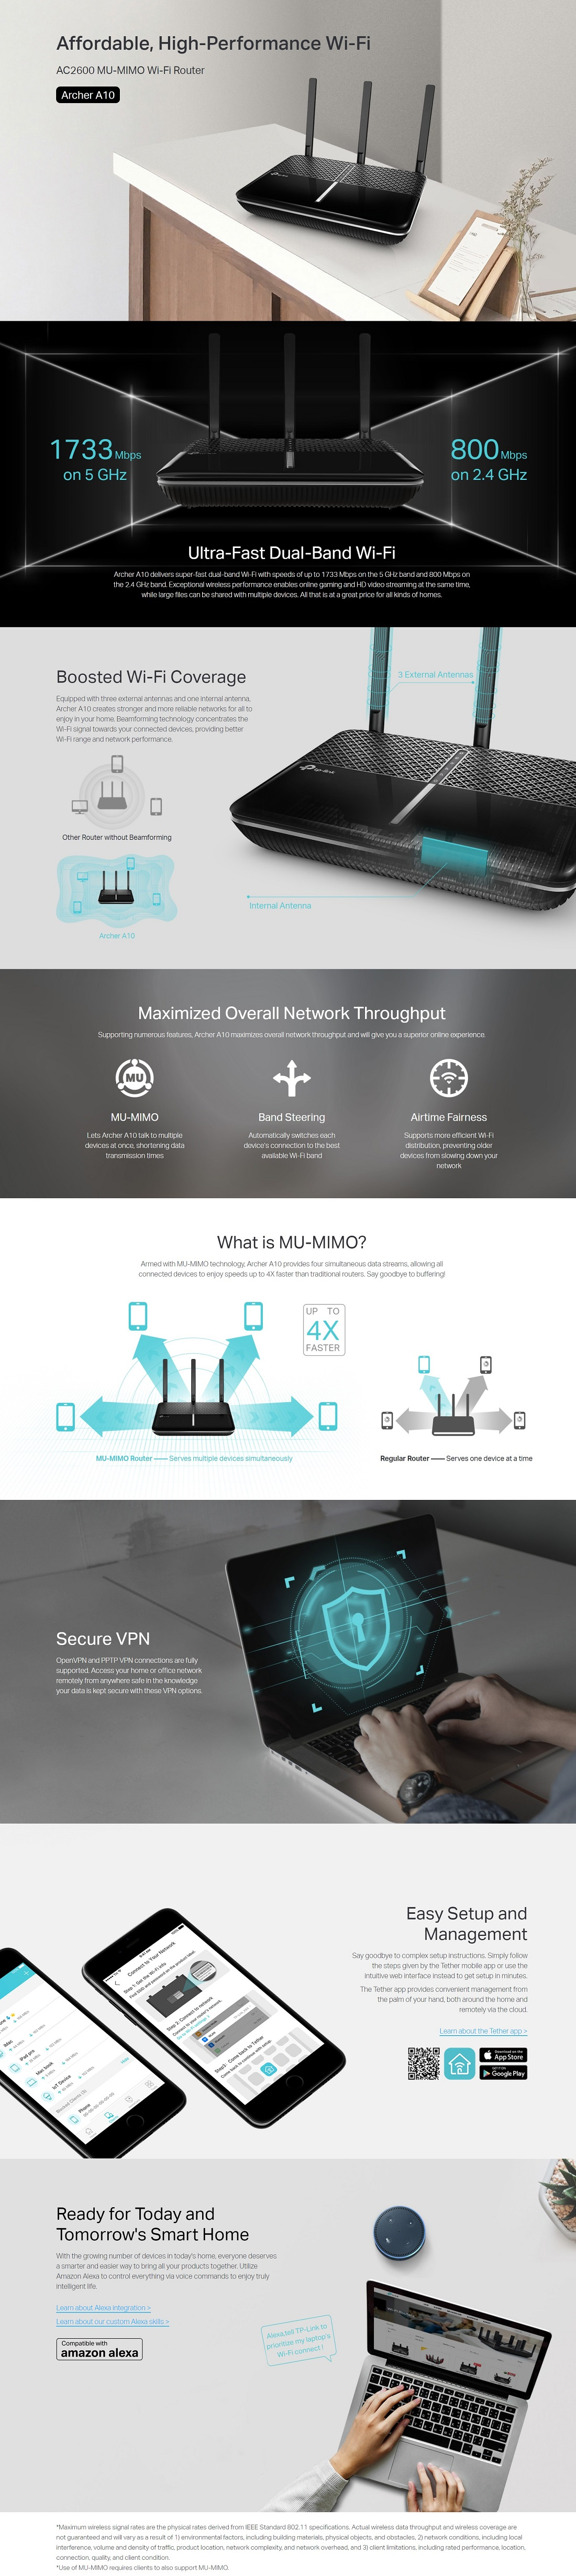 TP-Link Archer A10 AC2600 Wireless MU-MIMO Secure Remote Access Gigabit Router